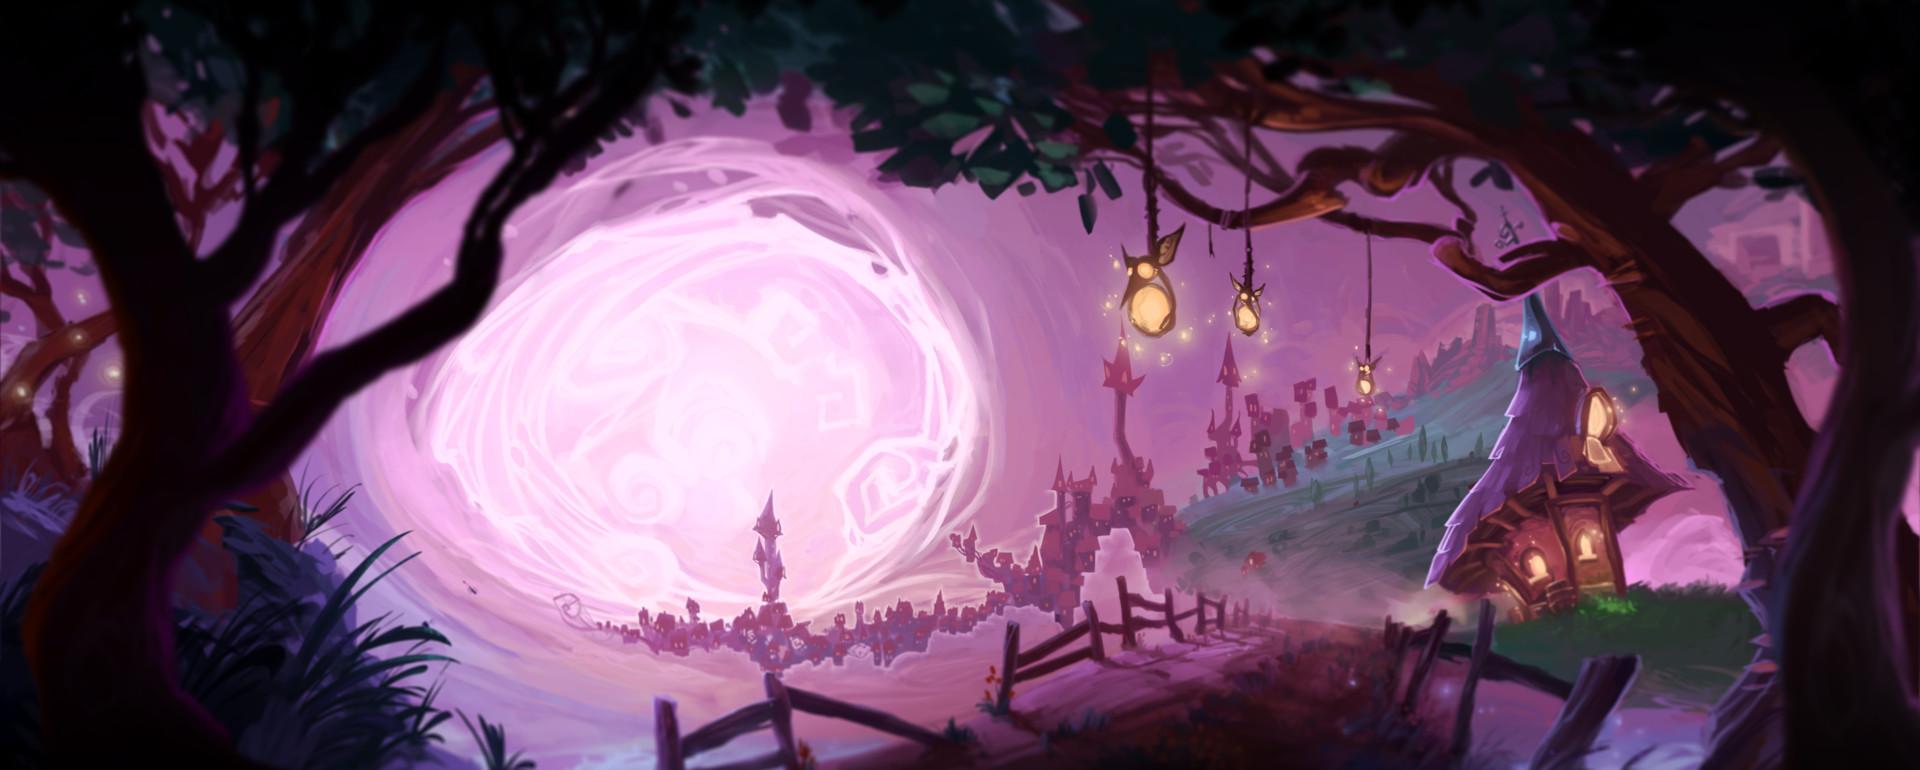 Etienne beschet lune arcanique v2